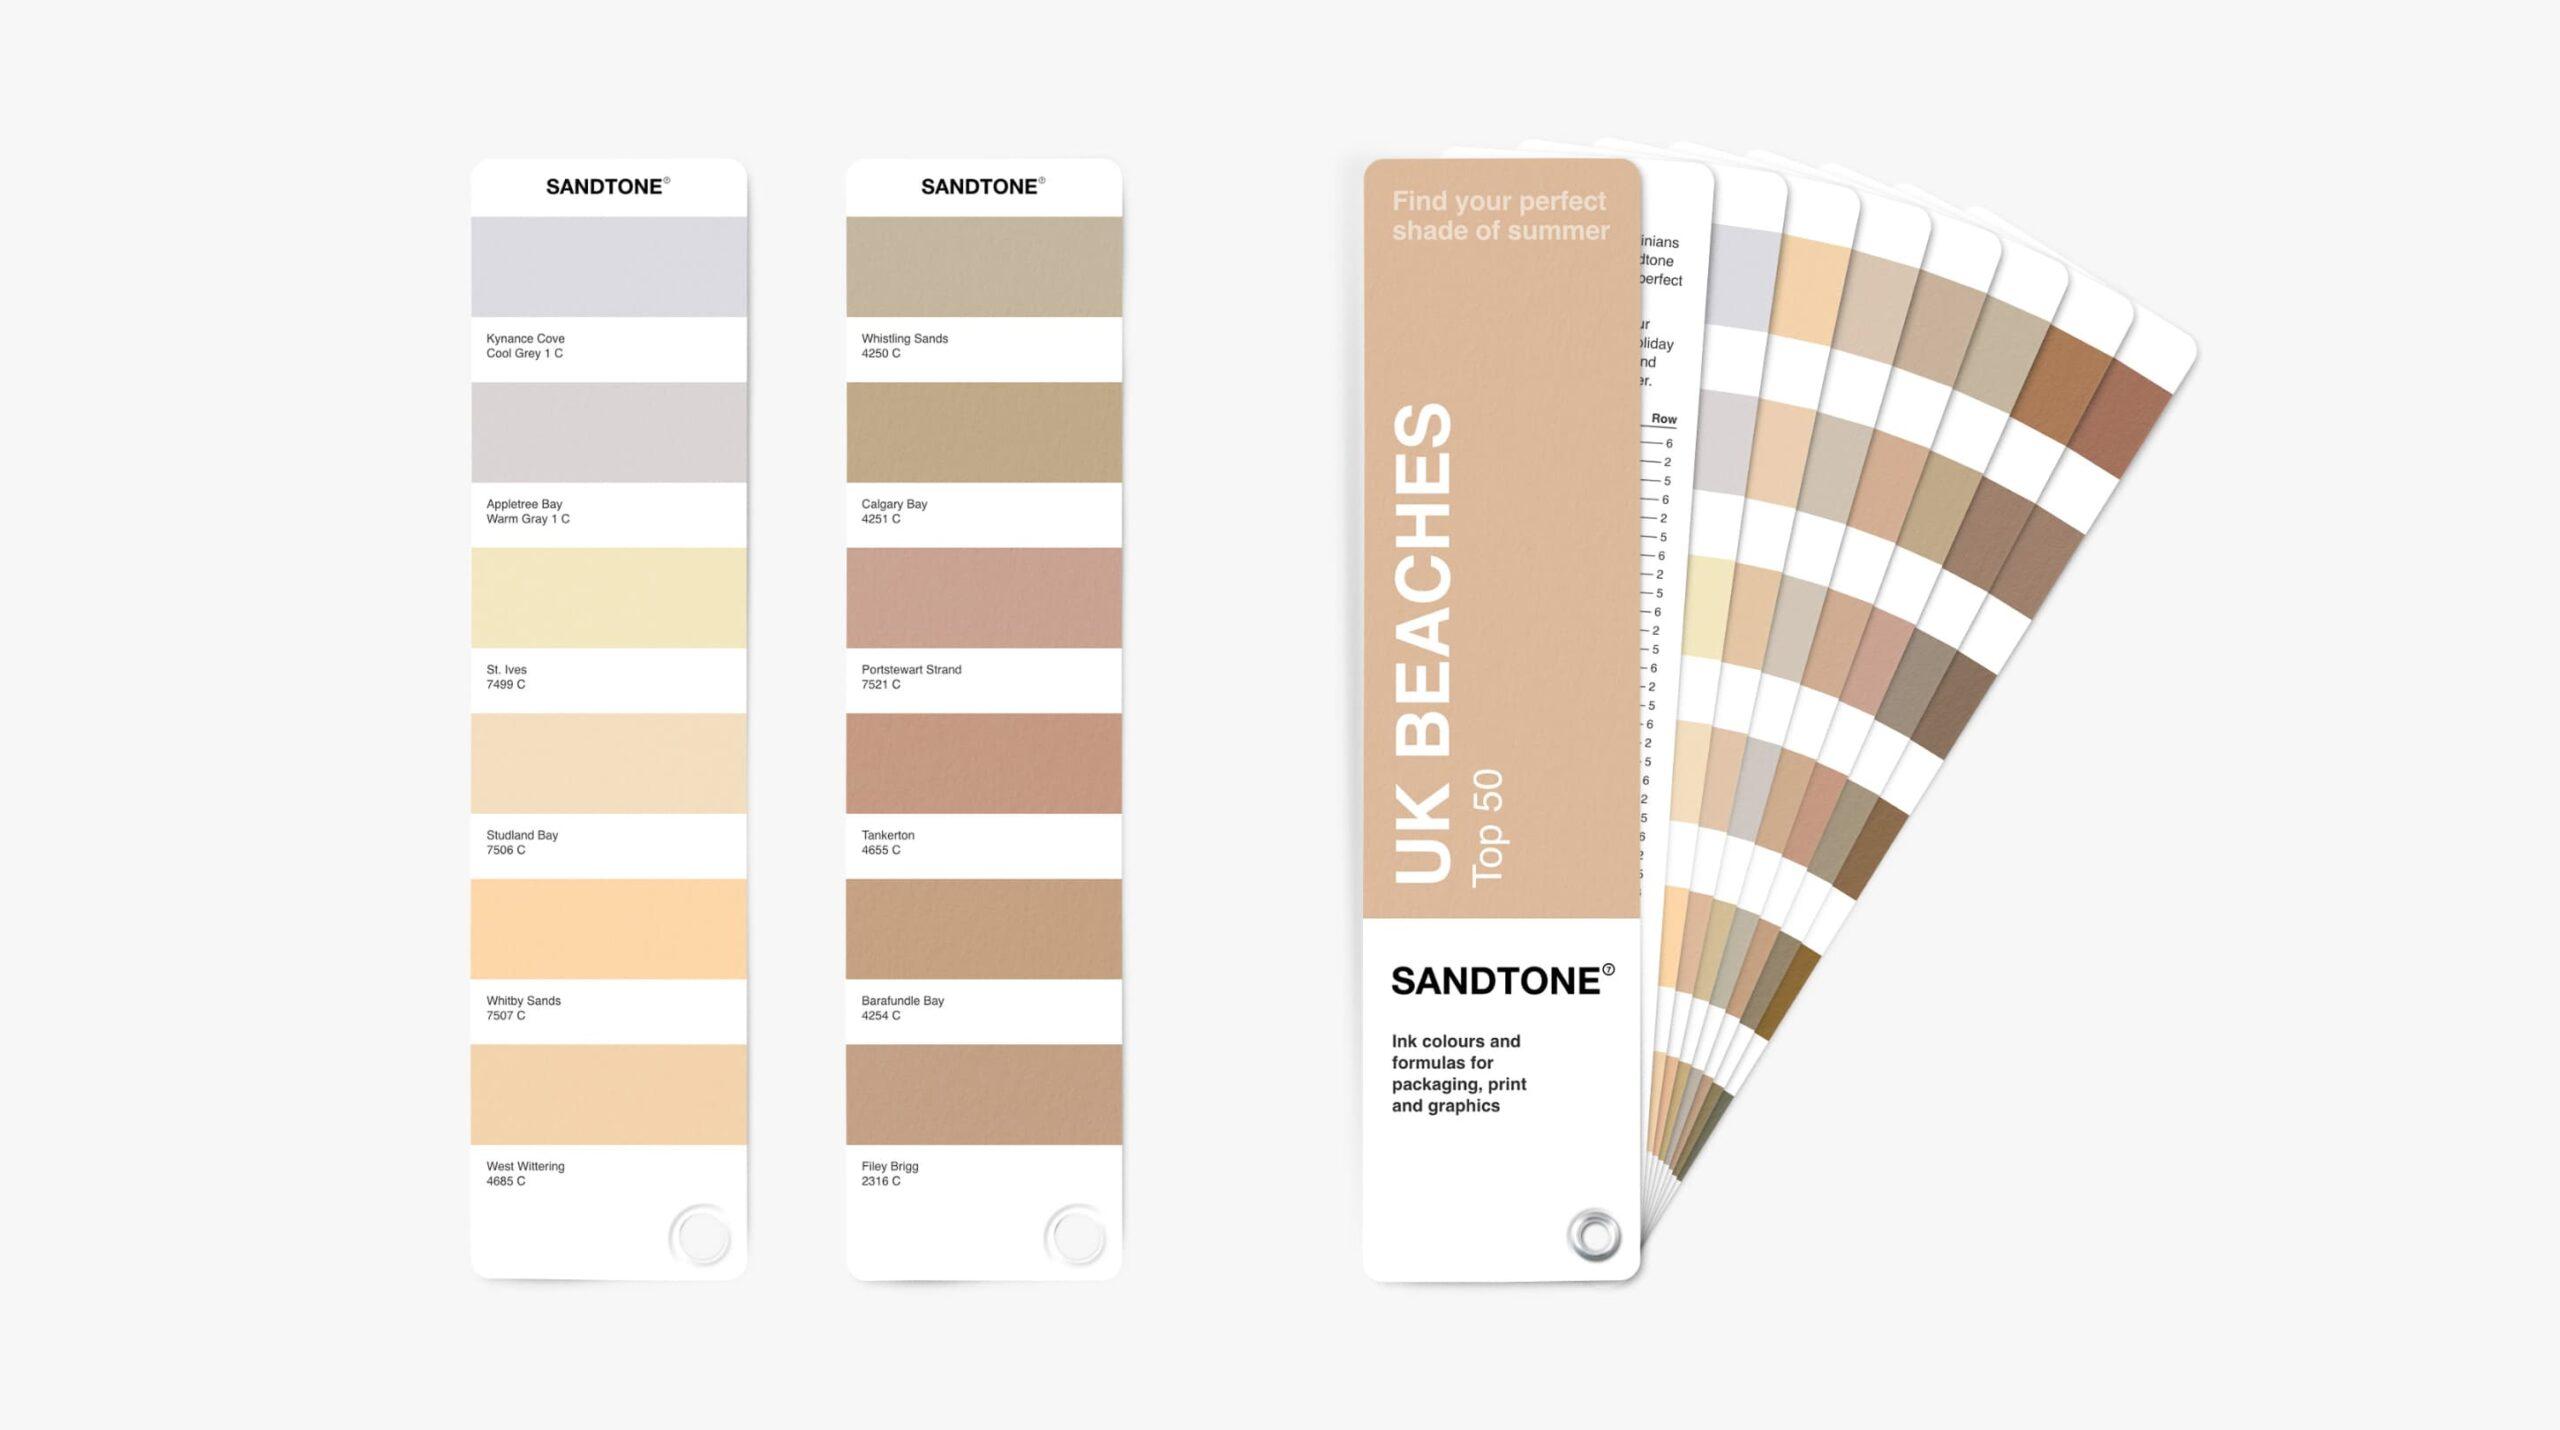 amy-jones-sandtone-pantone-sand-beach-colours-swatch-book@2x